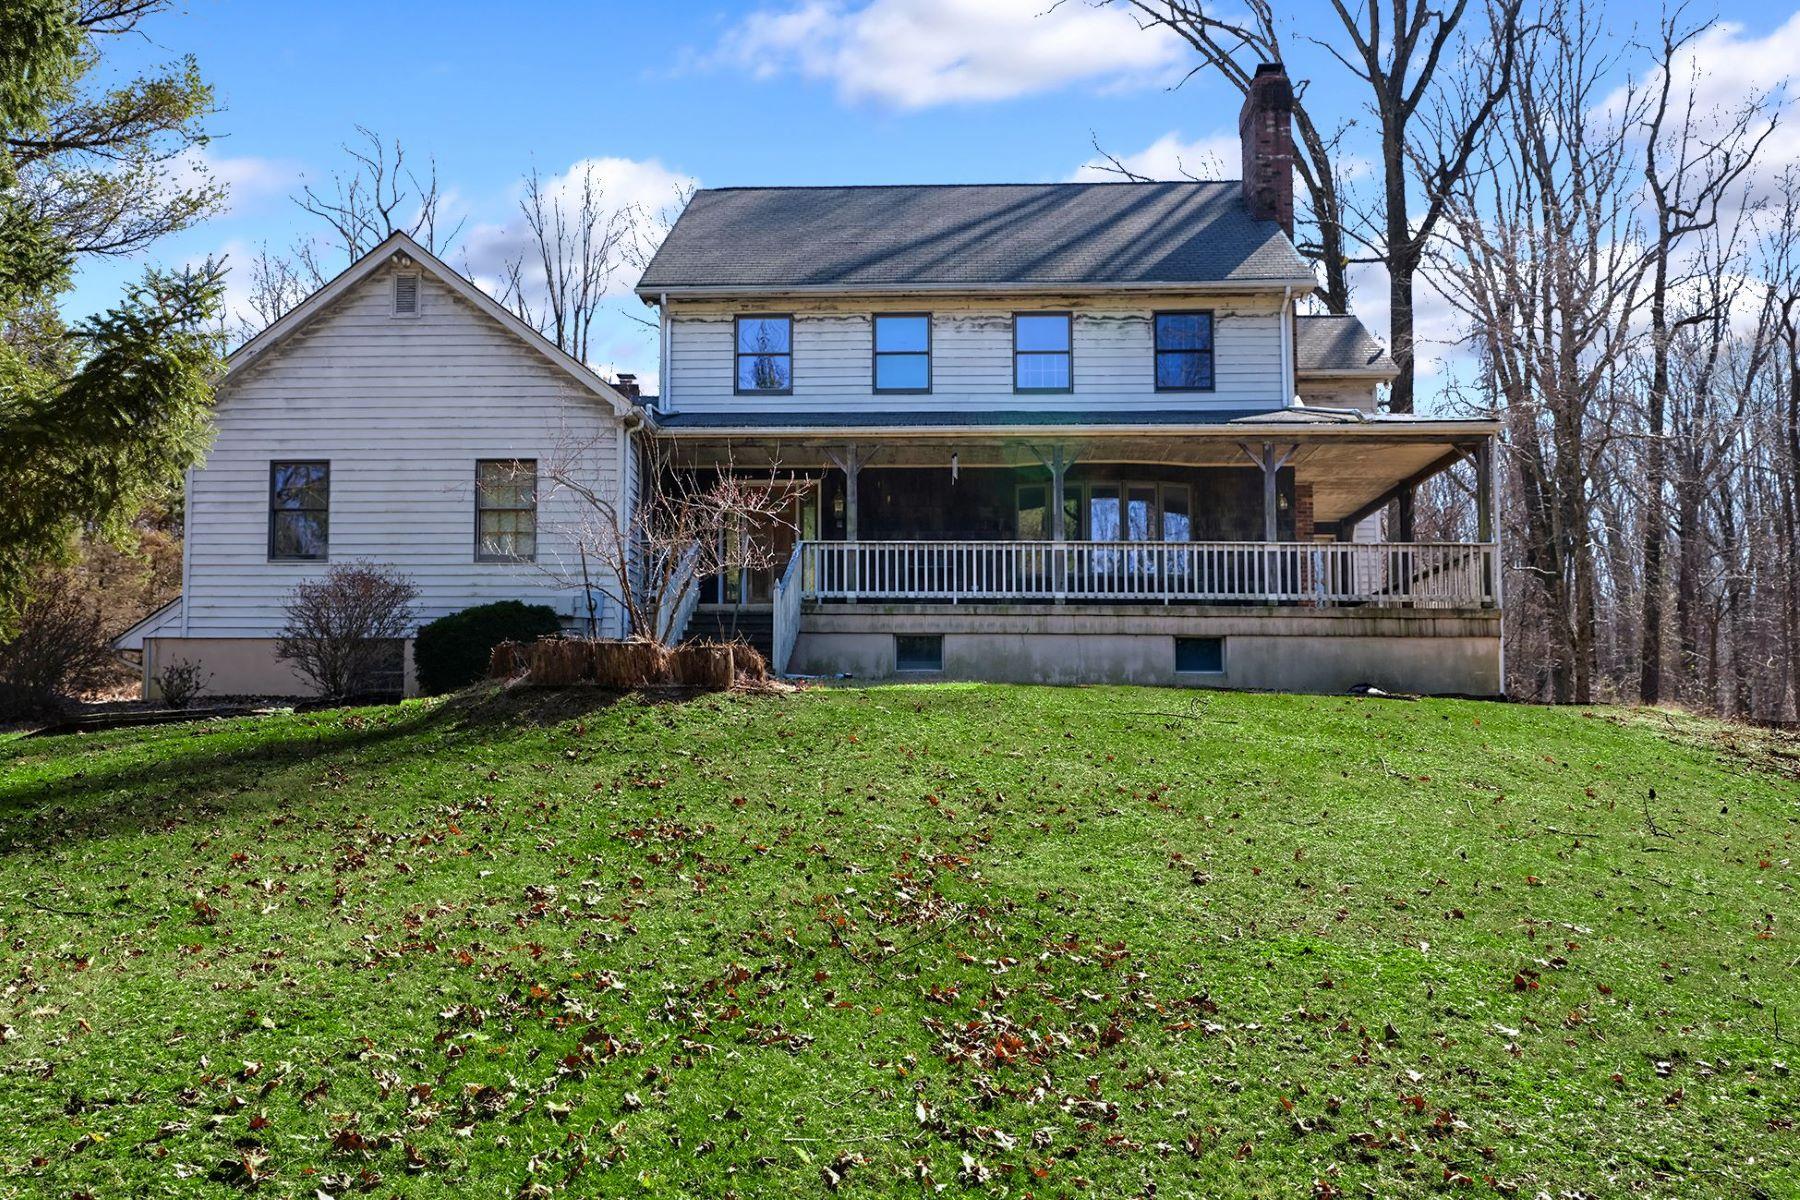 Single Family Homes για την Πώληση στο Surprisingly Private with Space to Spare 605 State Road, Princeton, Νιου Τζερσεϋ 08540 Ηνωμένες Πολιτείες